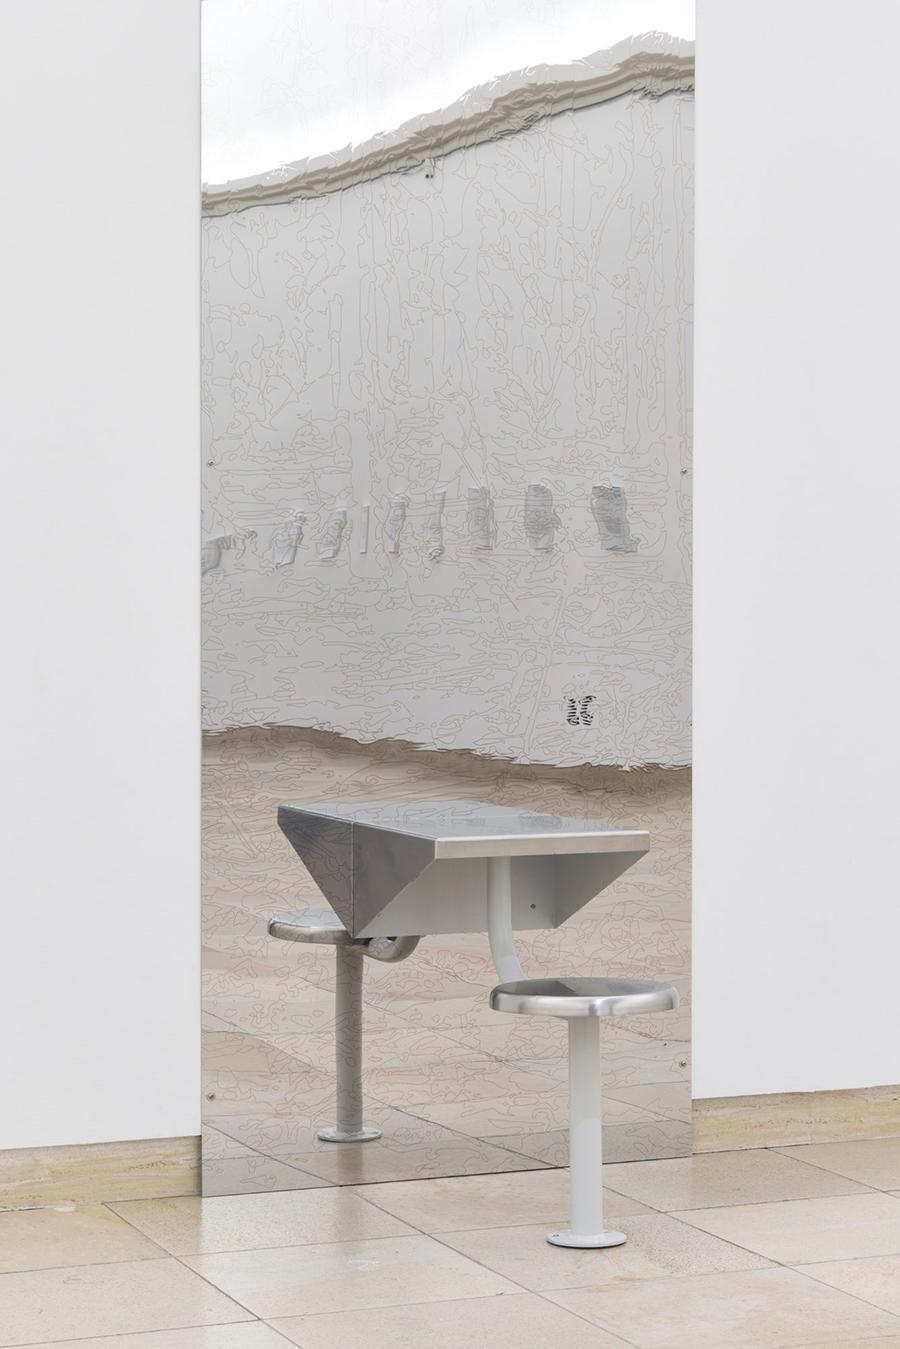 Sung Tieu, Haus der Kunst